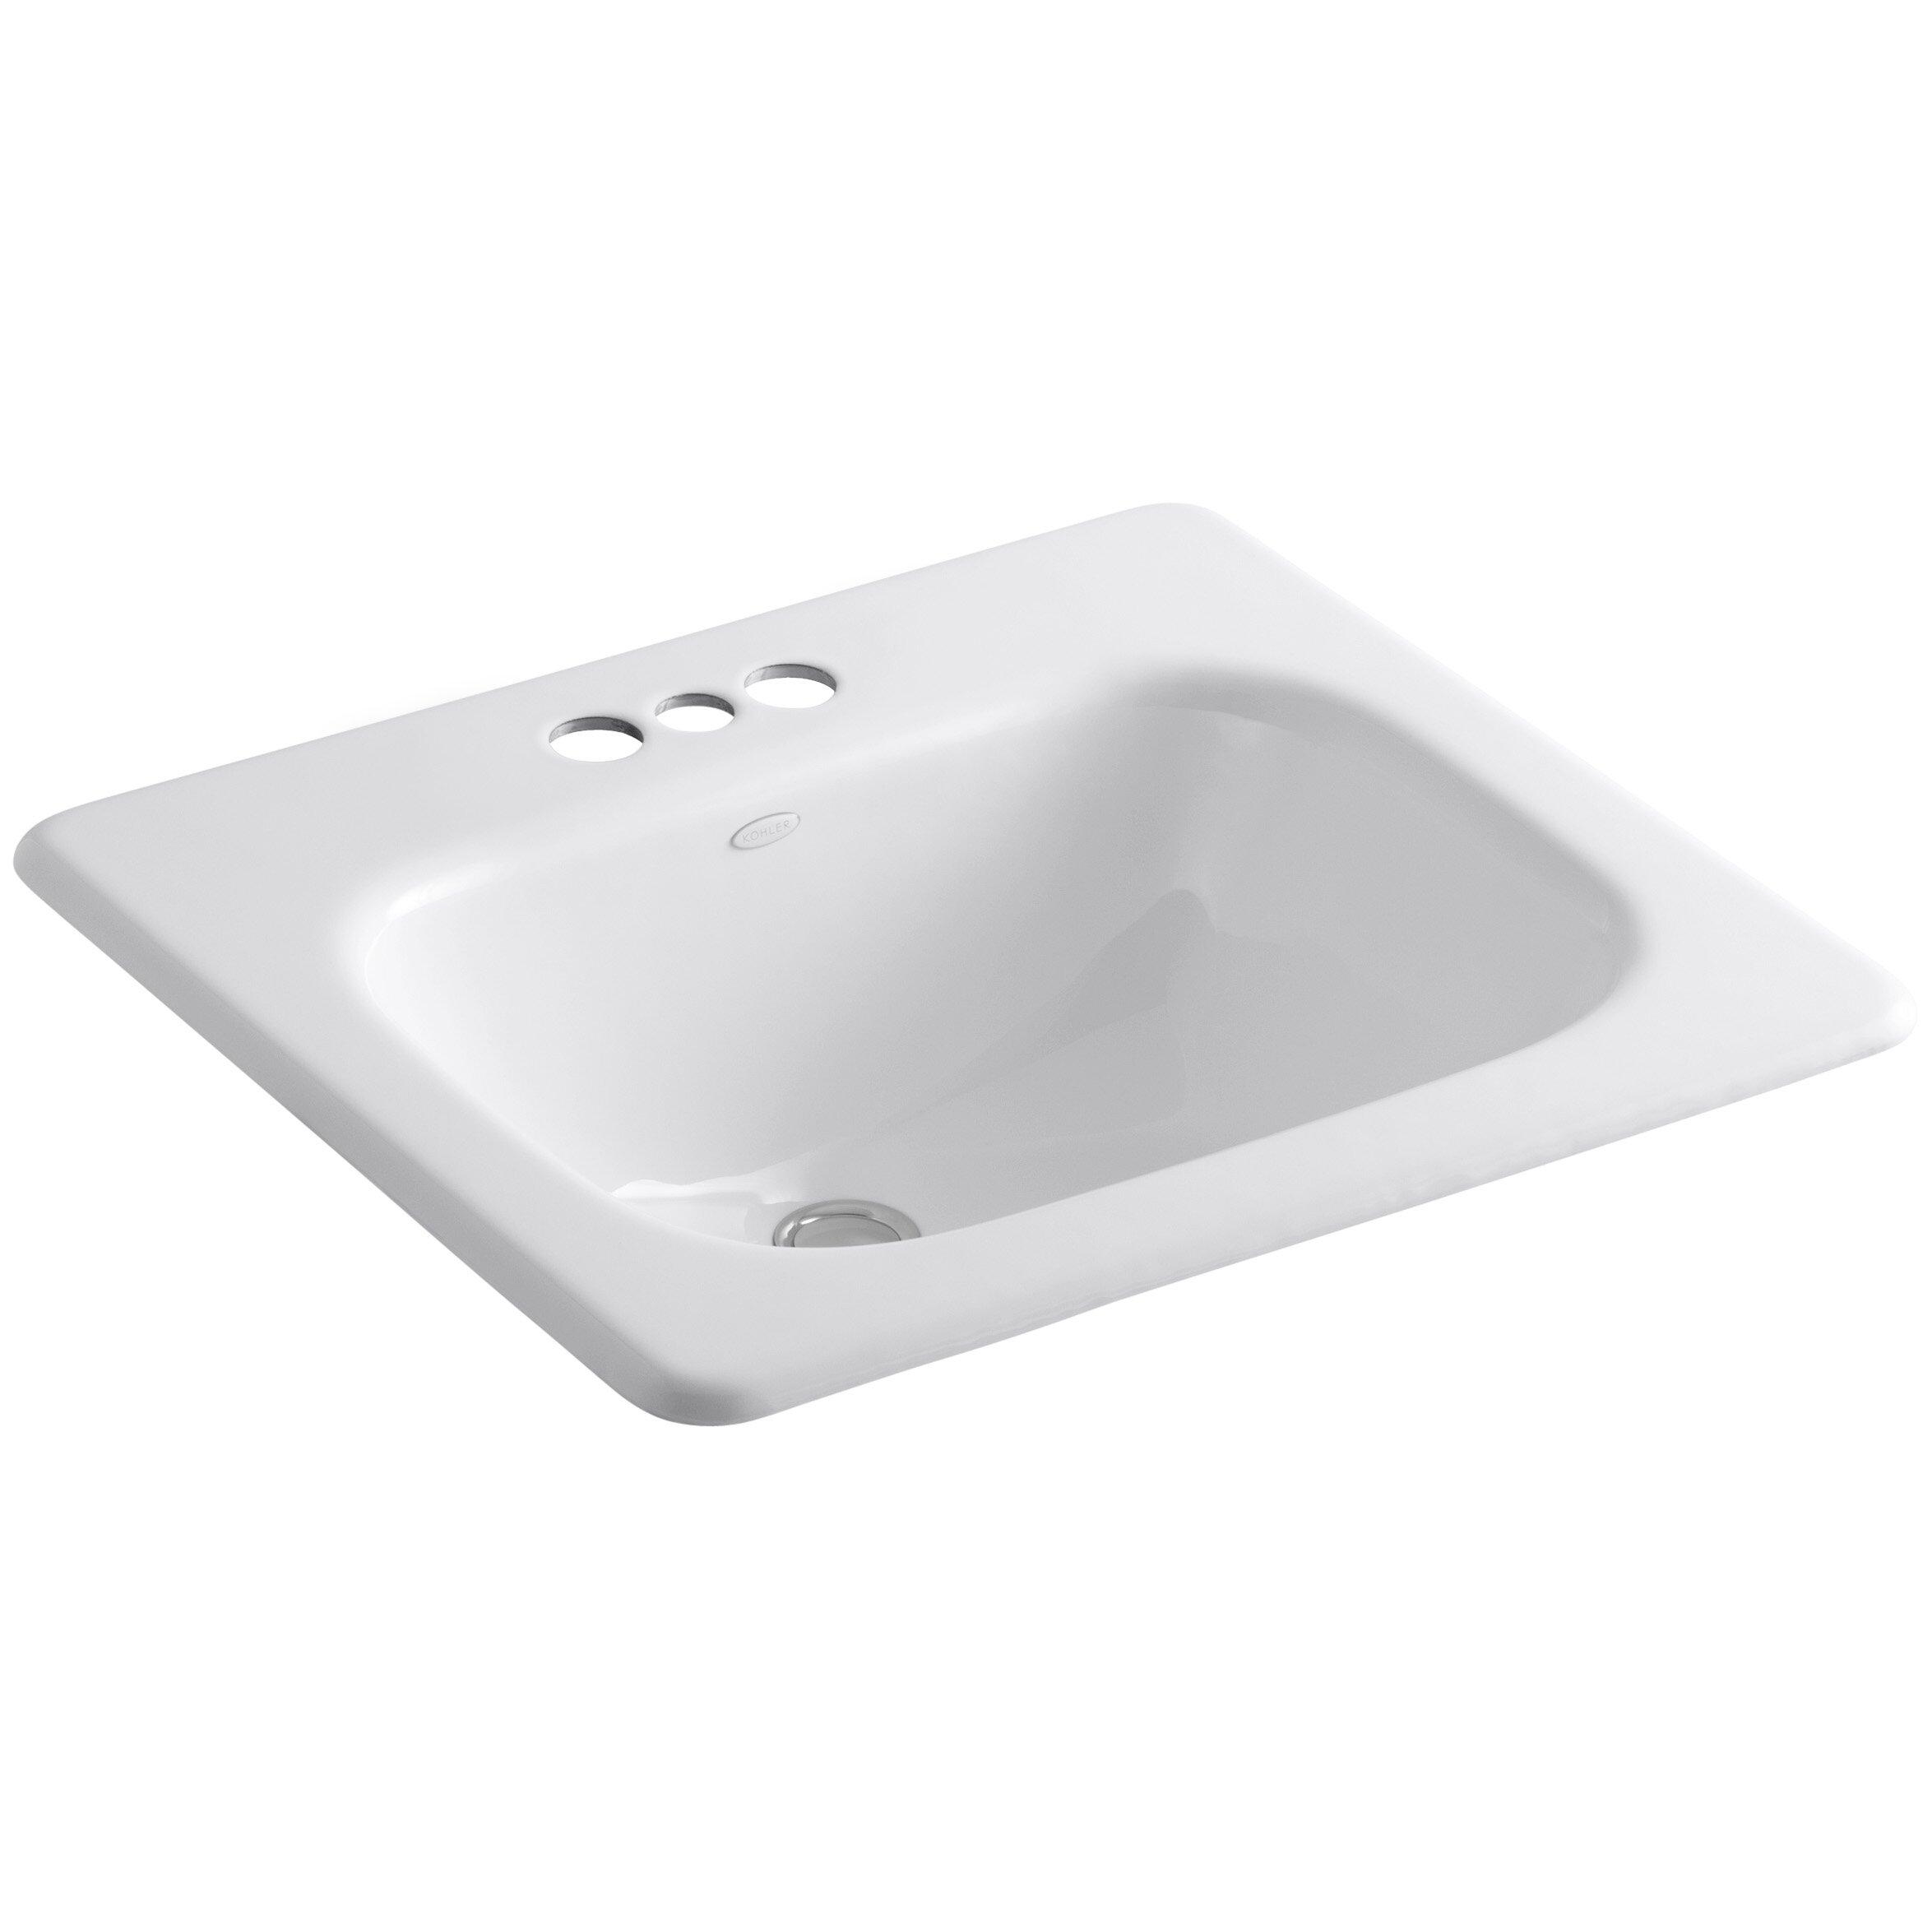 kohler tahoe drop in bathroom sink with 4 centerset faucet holes